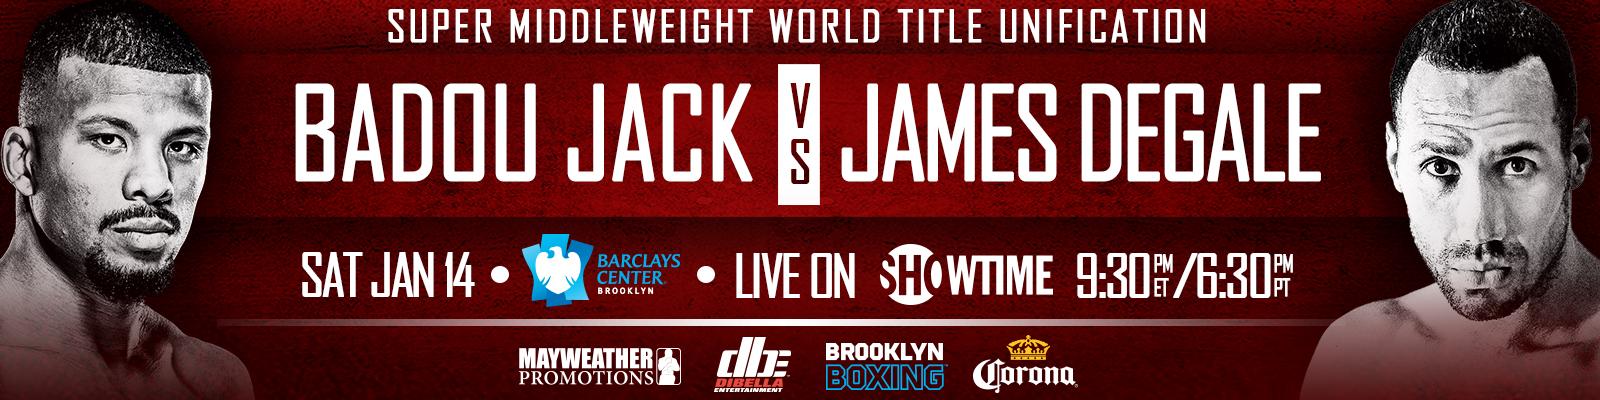 1.14.17-Jack-vs-DeGale-Letterhead